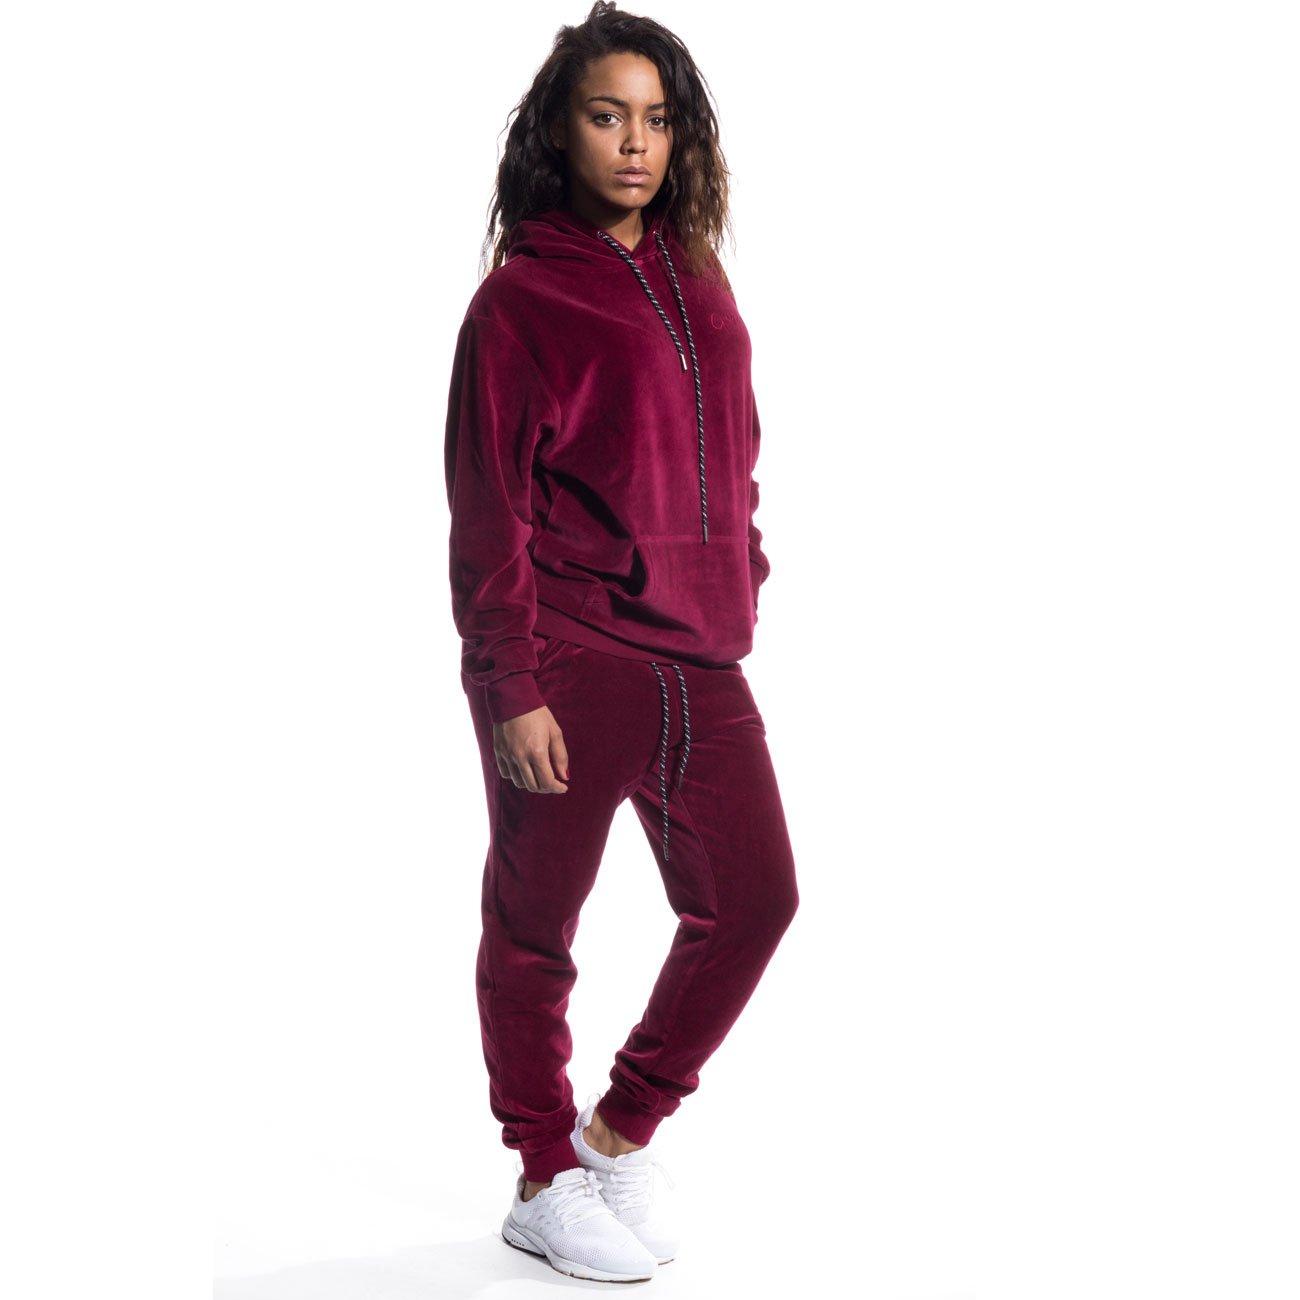 Grimey Pantalon Chandal Velour Sweatpants FW16 Wine-XS: Amazon.es ...